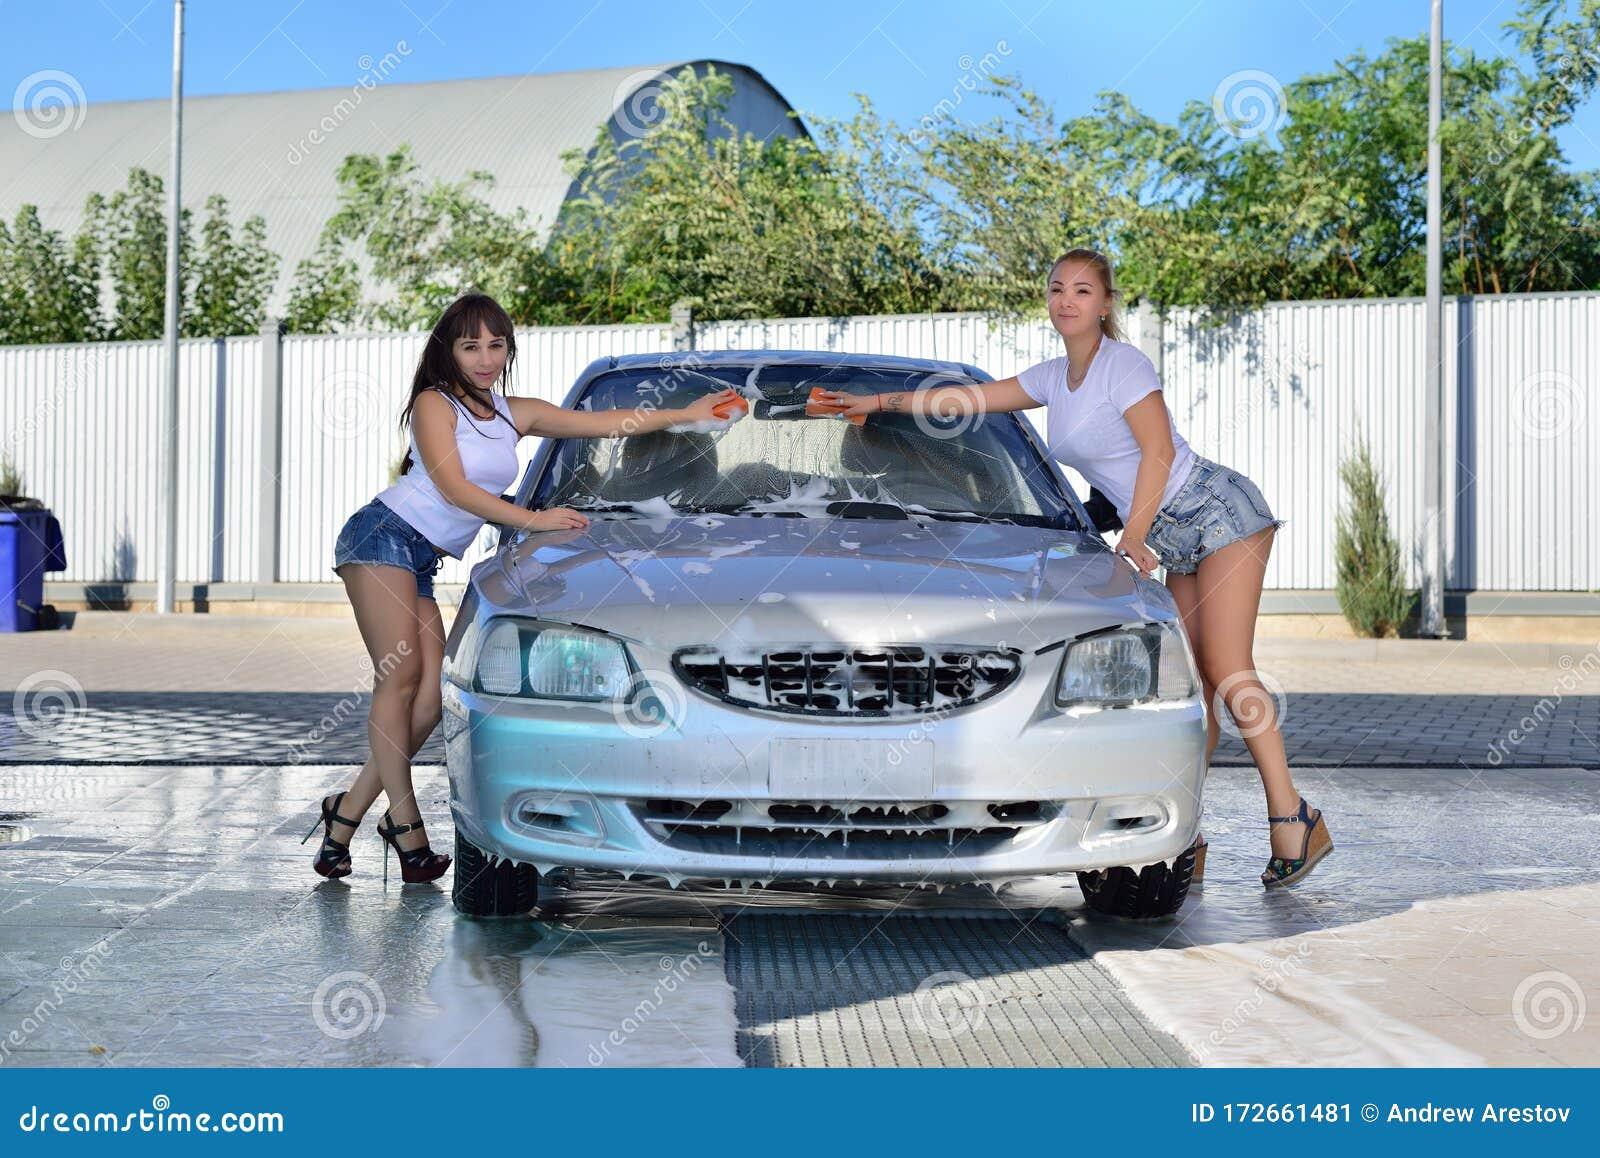 Girls car wash Car Washes